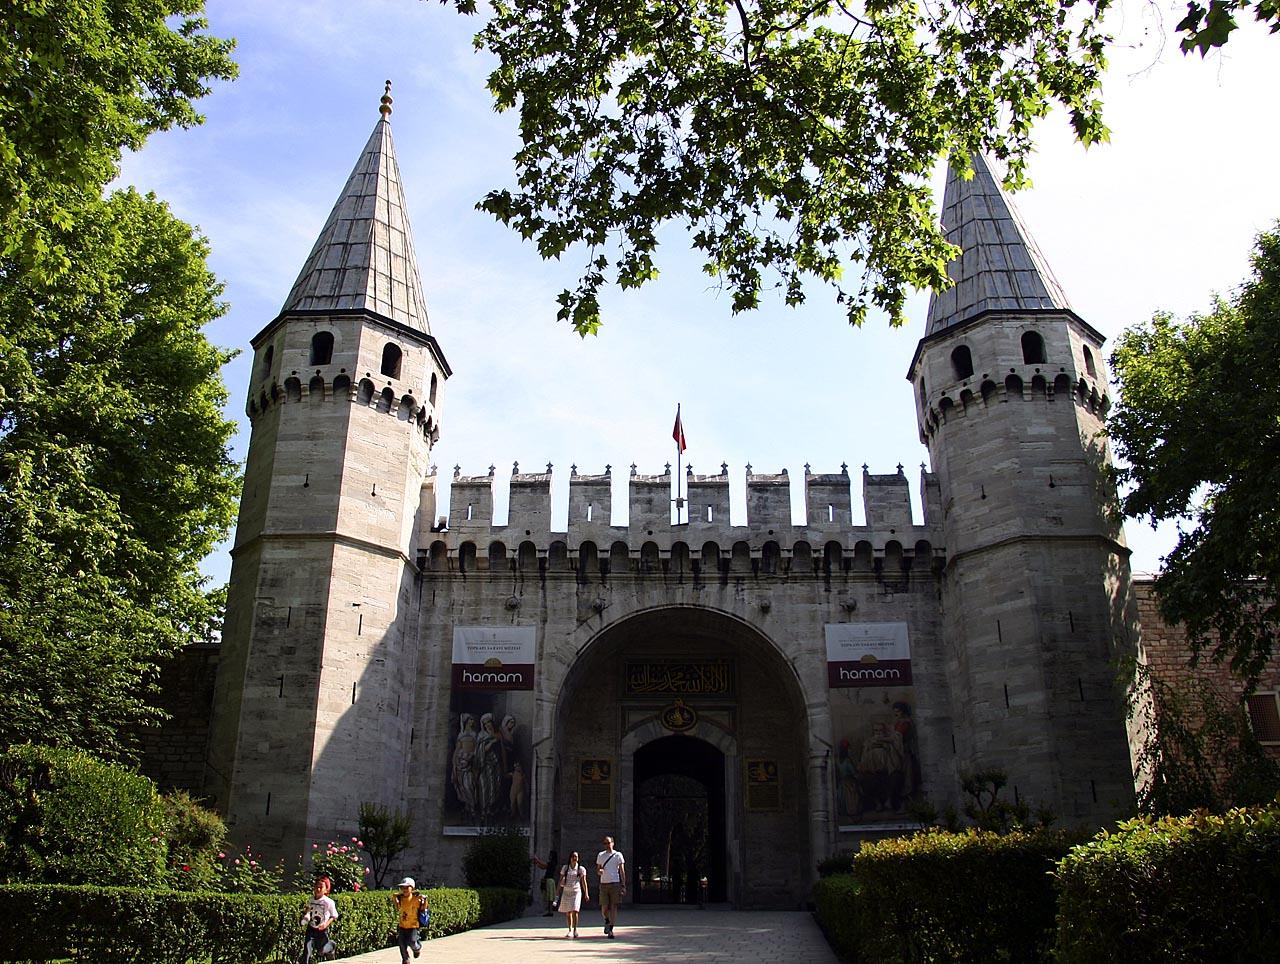 http://www.tunliweb.no/Bilder_SM/_album_istanbul/6819_tokapi_paalce.jpg